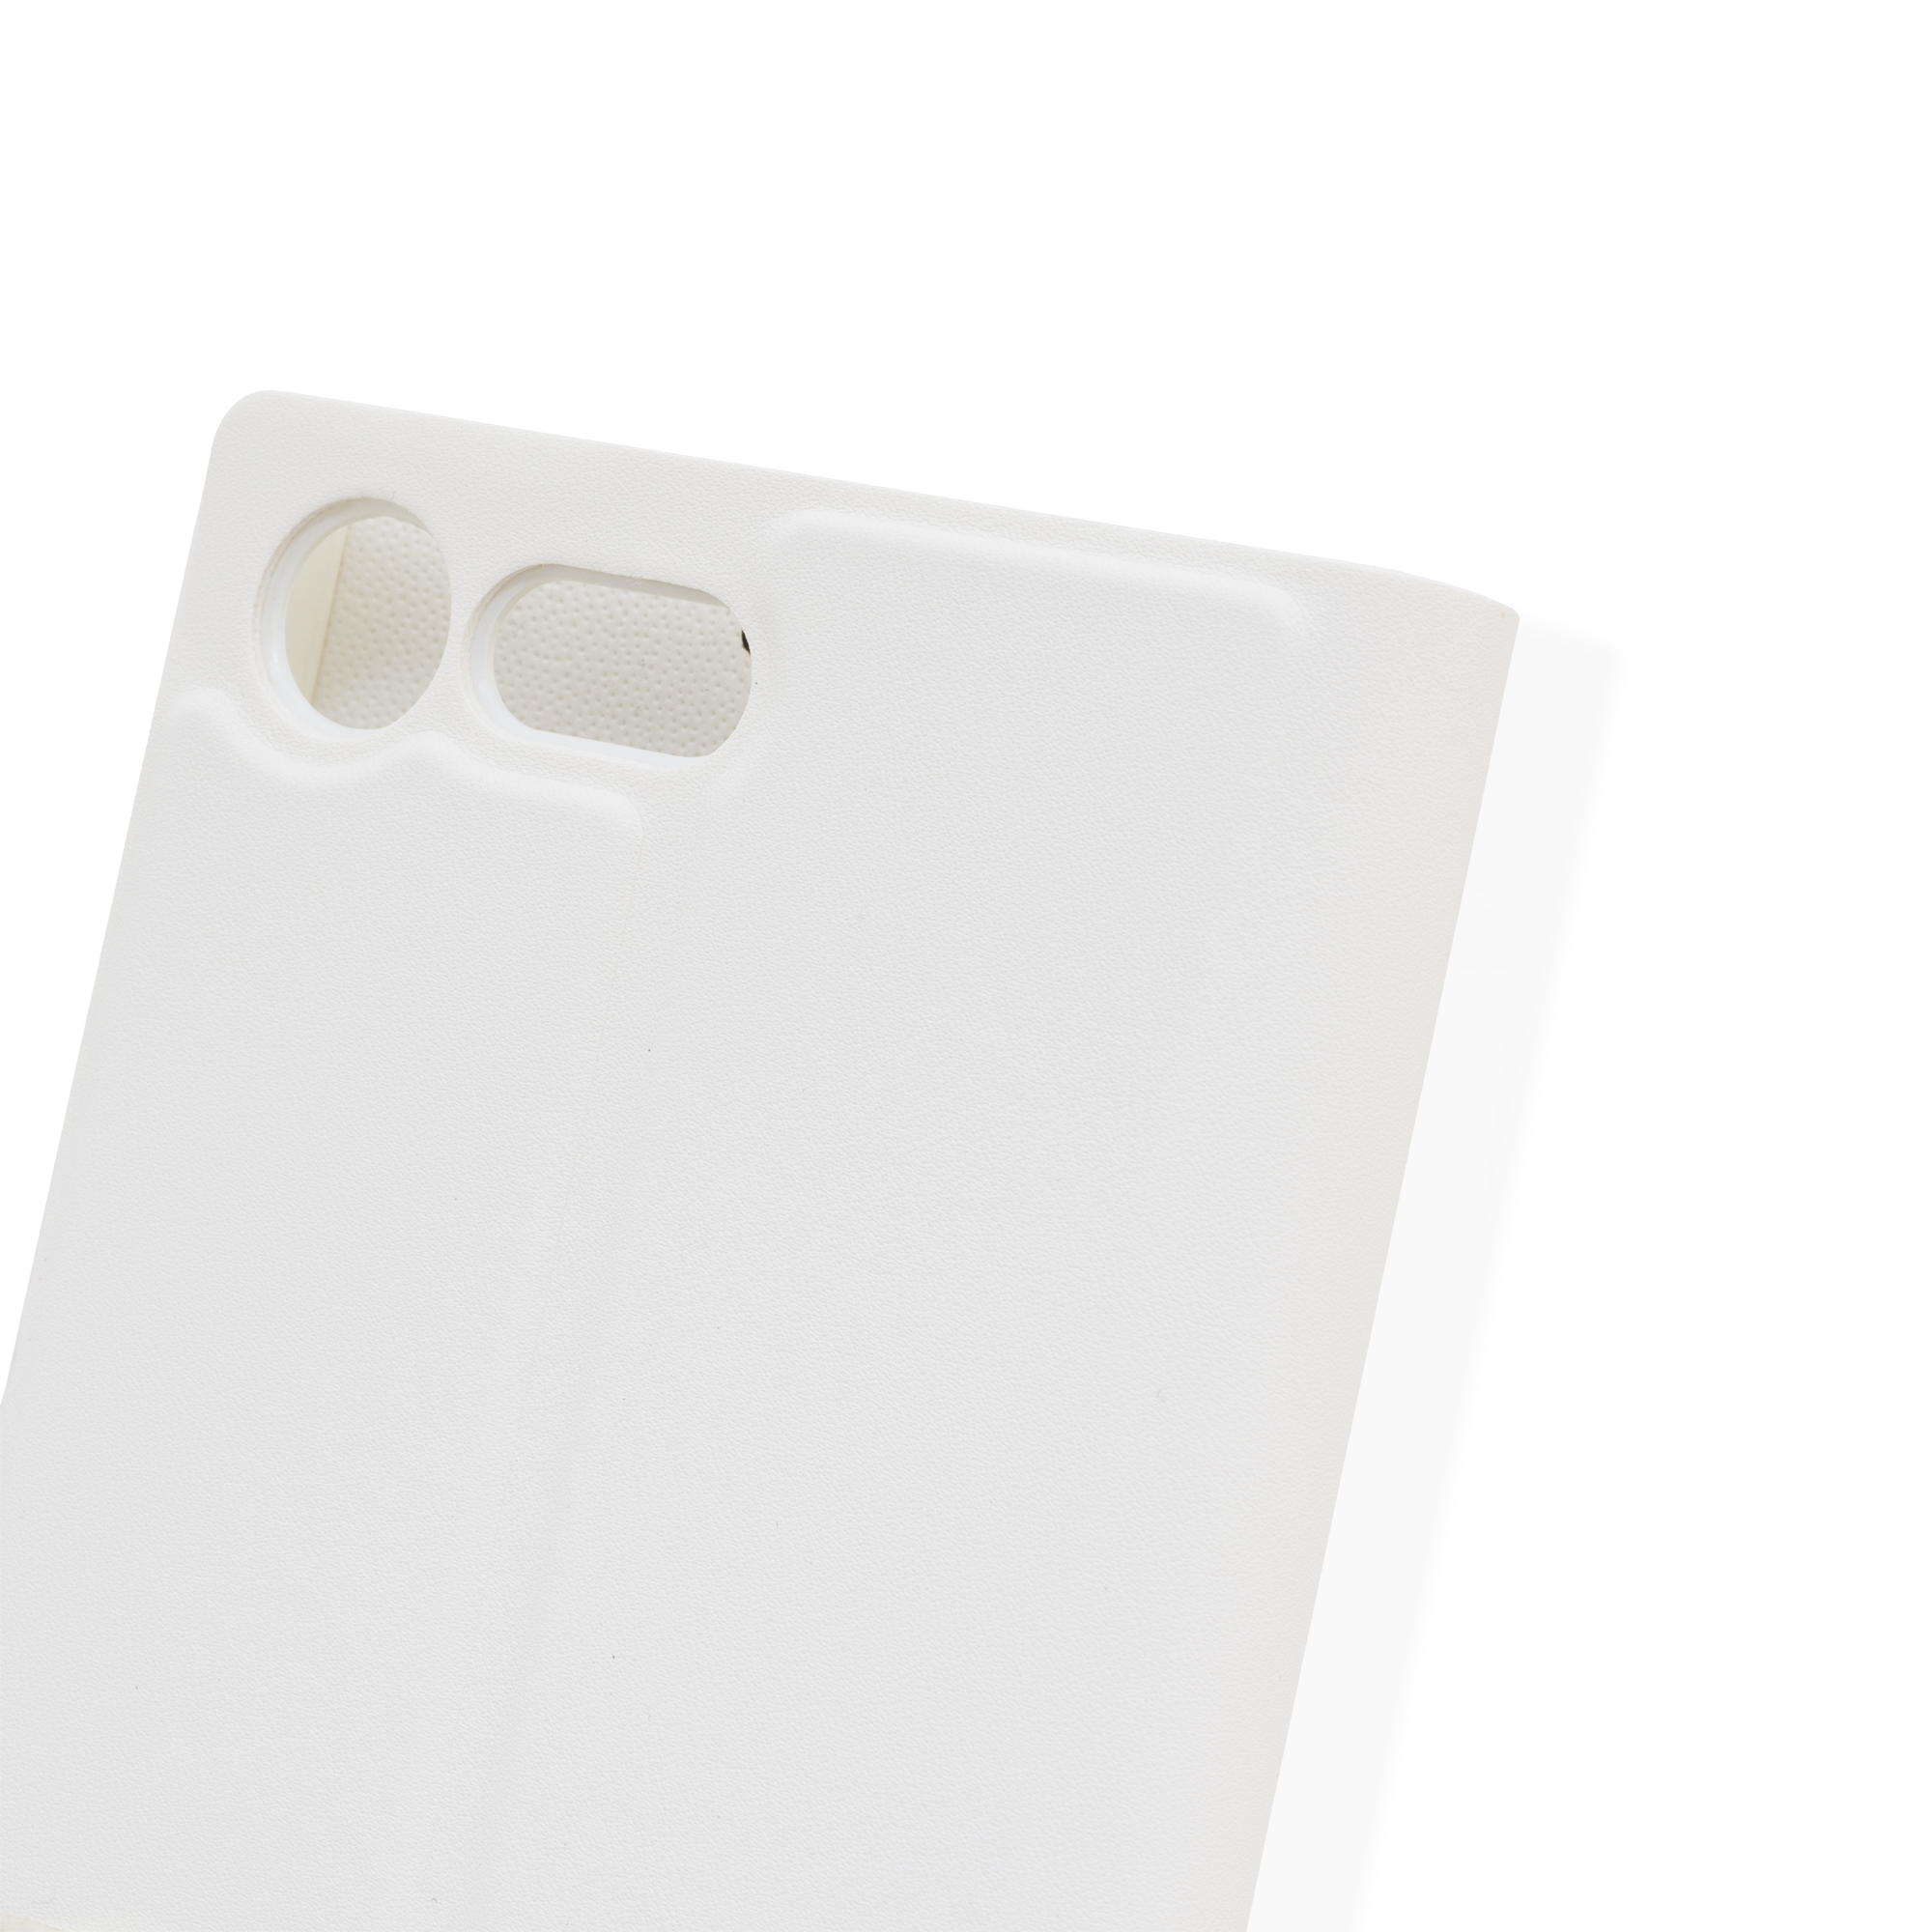 Чехол белого цвета для Xperia X Compact купить в Sony Centre Воронеж